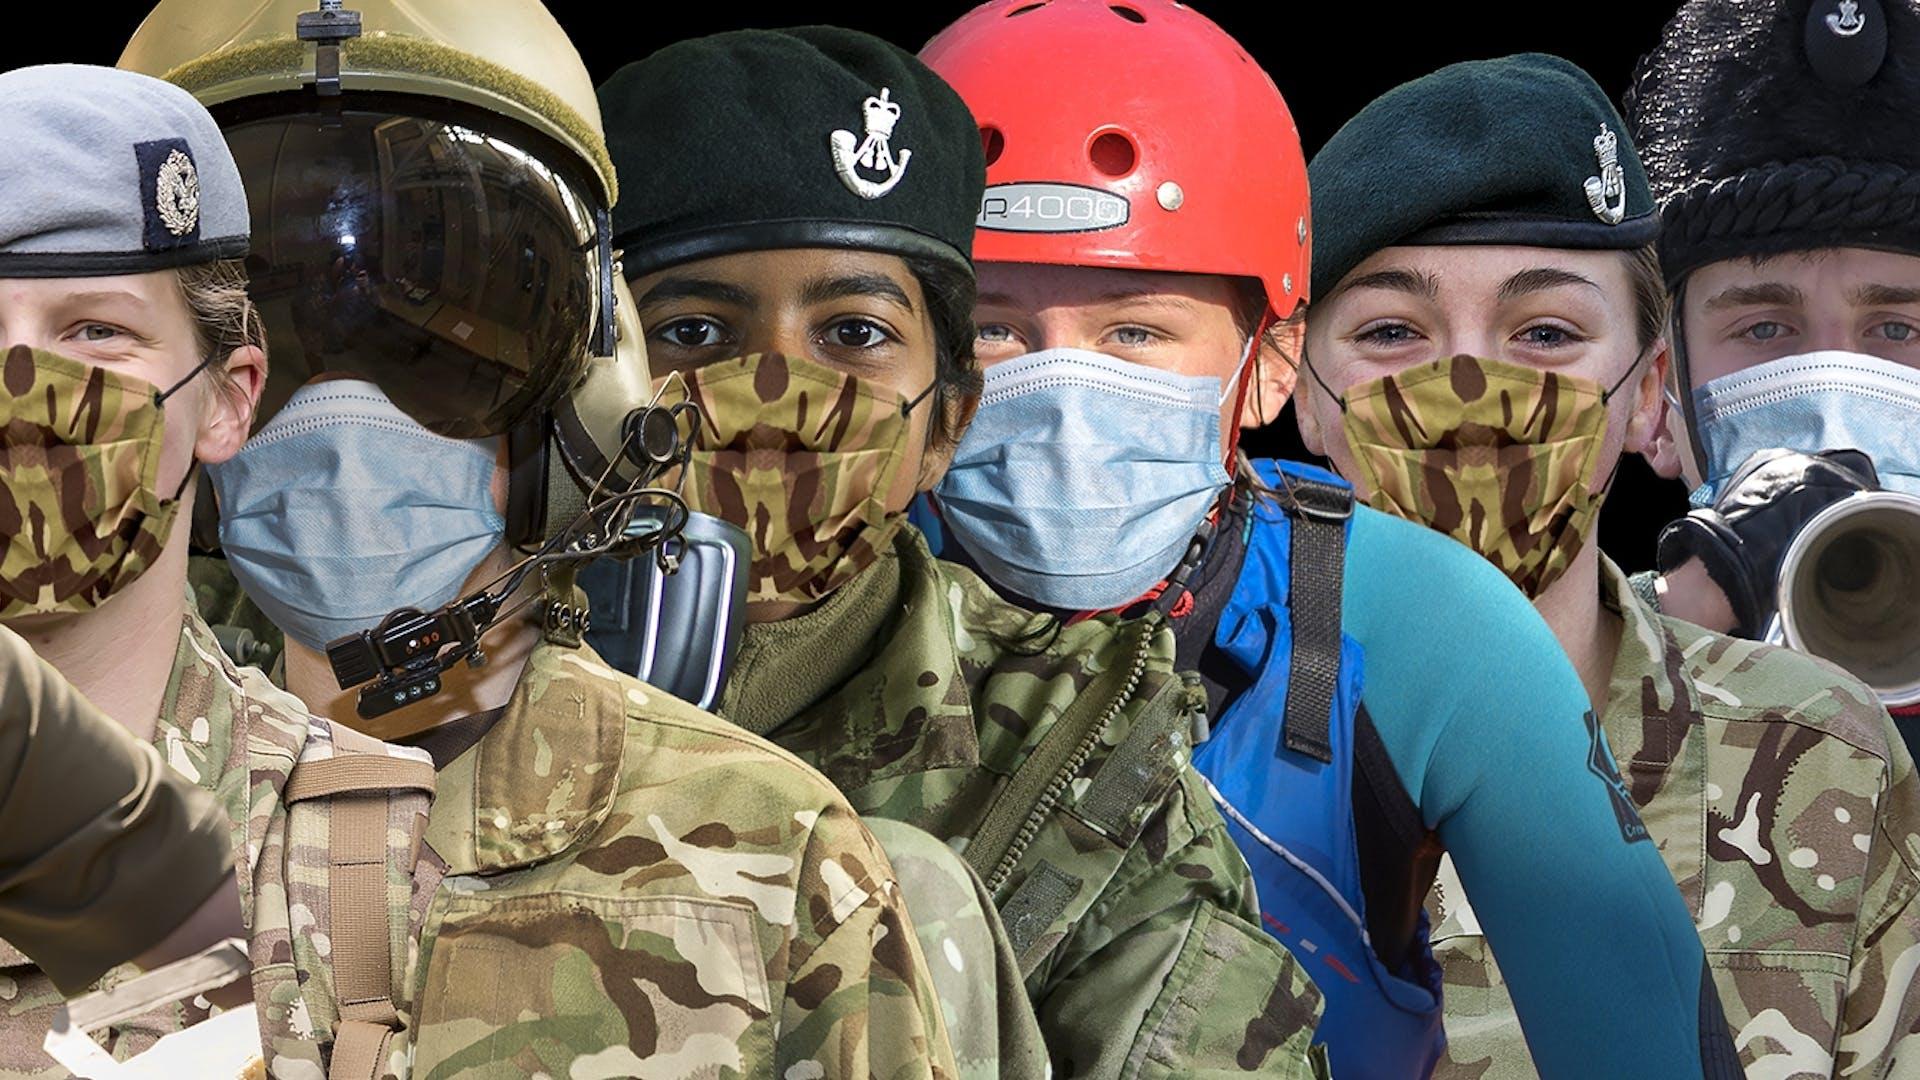 20210211 Web Hdr Somerset Diversity Masks